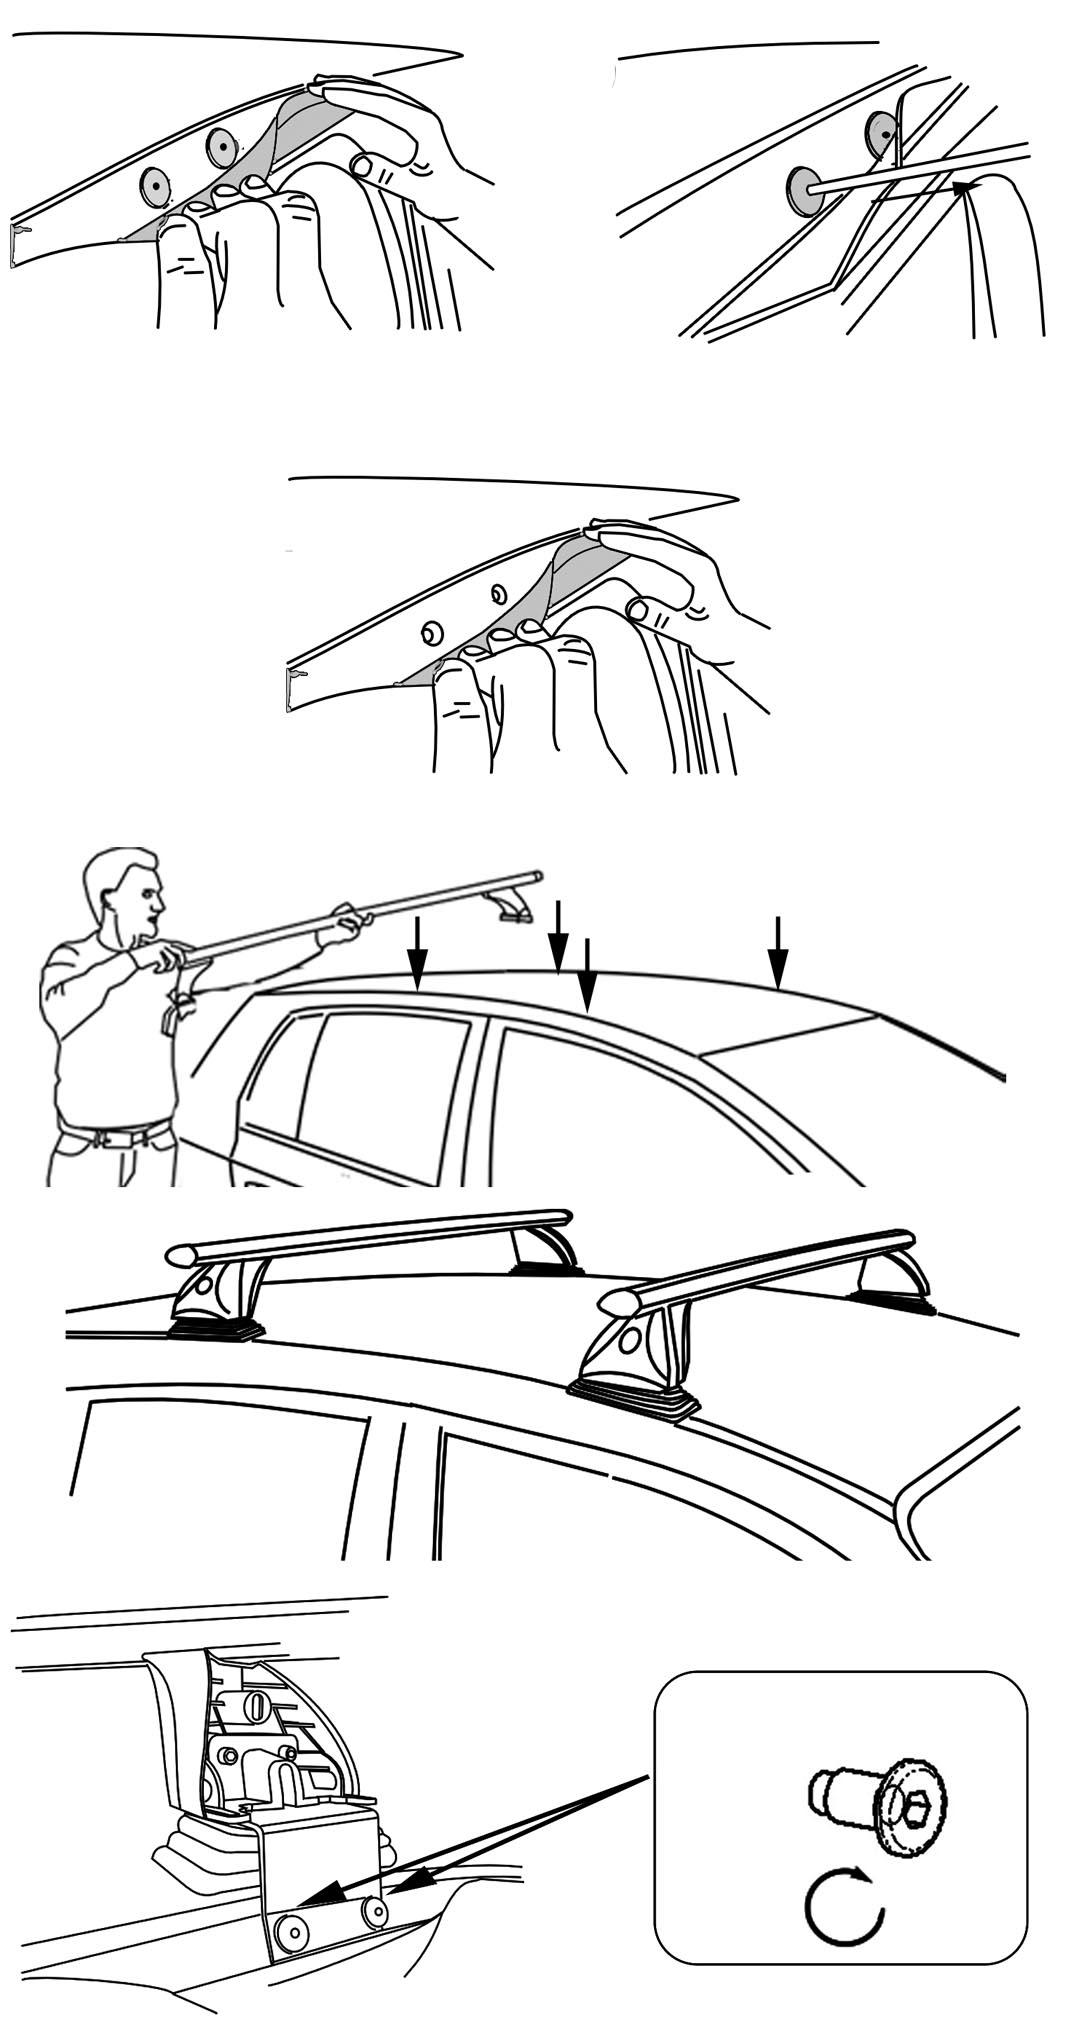 Roof Bars aurilis Original Renault Grand Mode ( HATCH 5